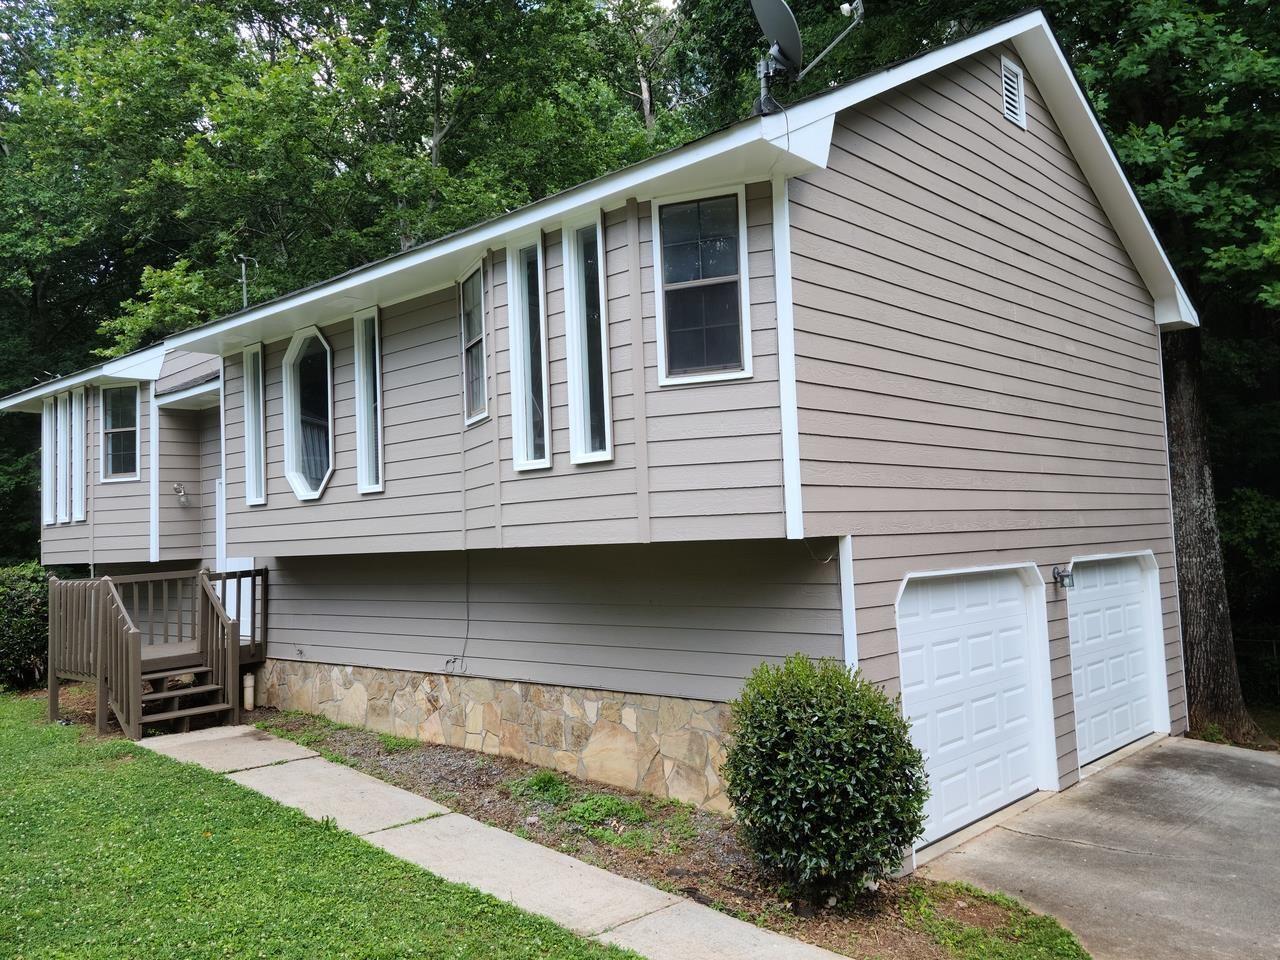 532 Rockmill, Lawrenceville, GA 30044 - MLS#: 8995779